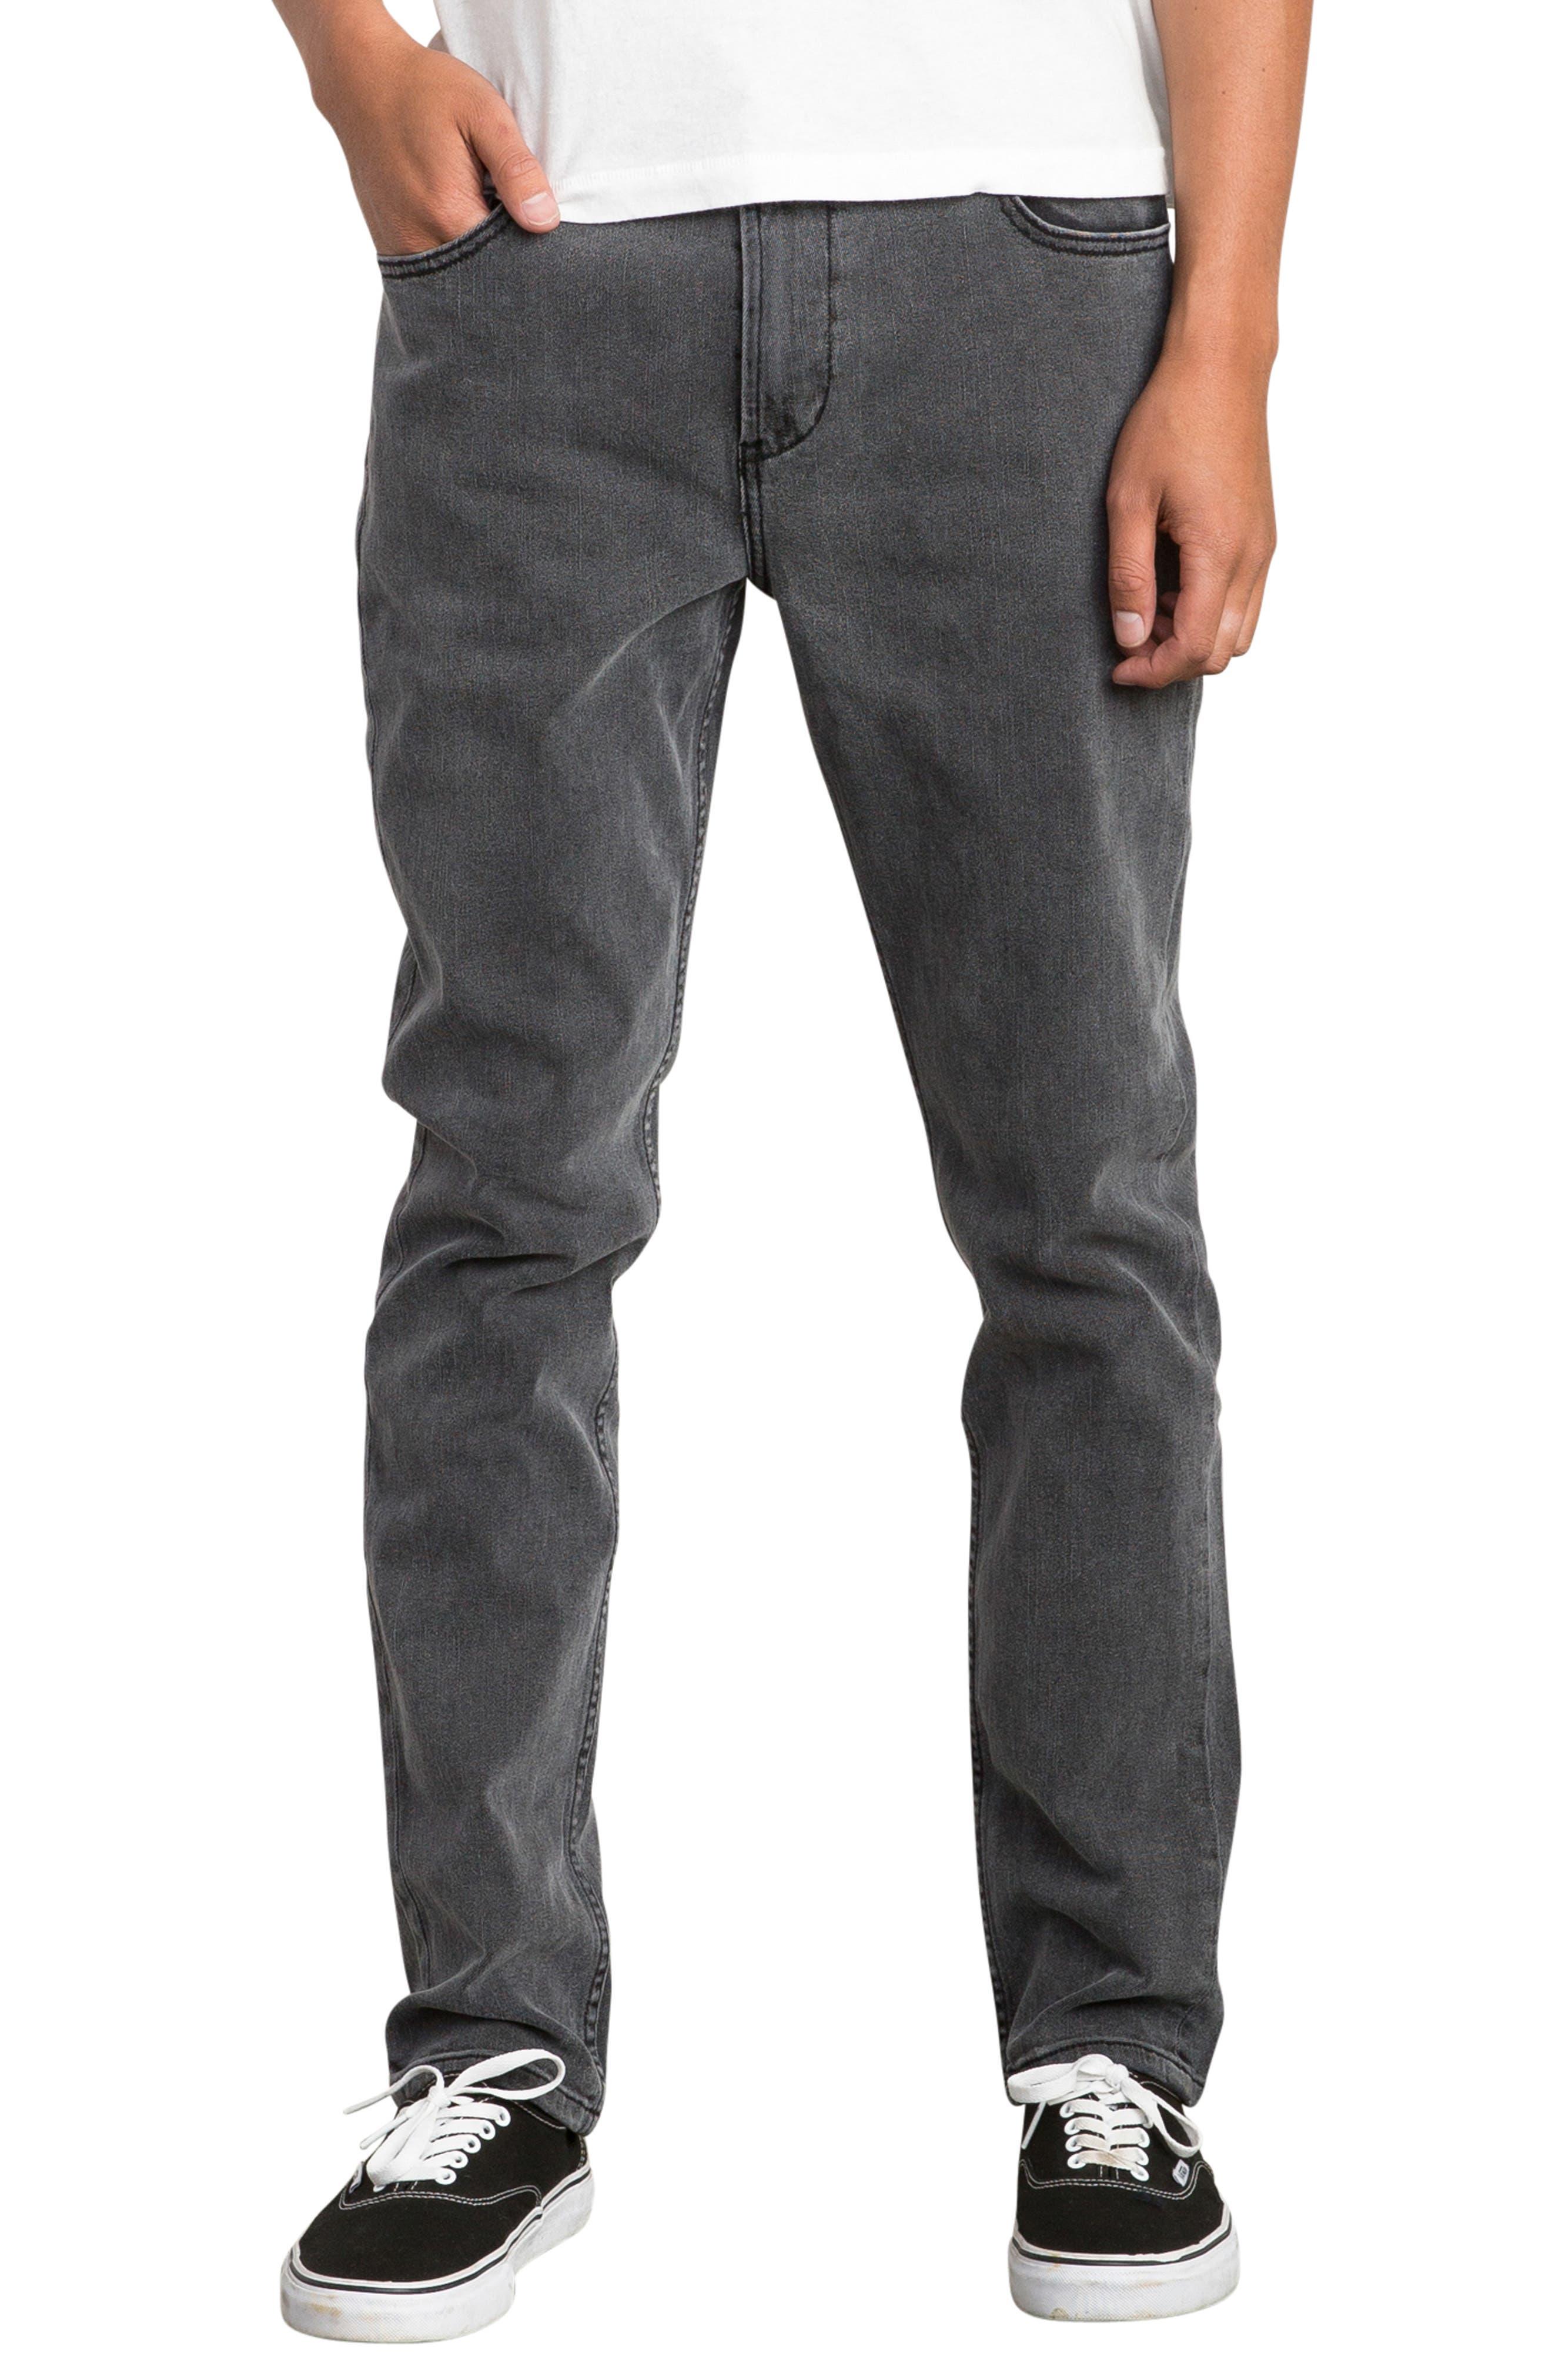 Daggers Slim Straight Leg Jeans,                             Main thumbnail 1, color,                             VINTAGE CHARCOAL